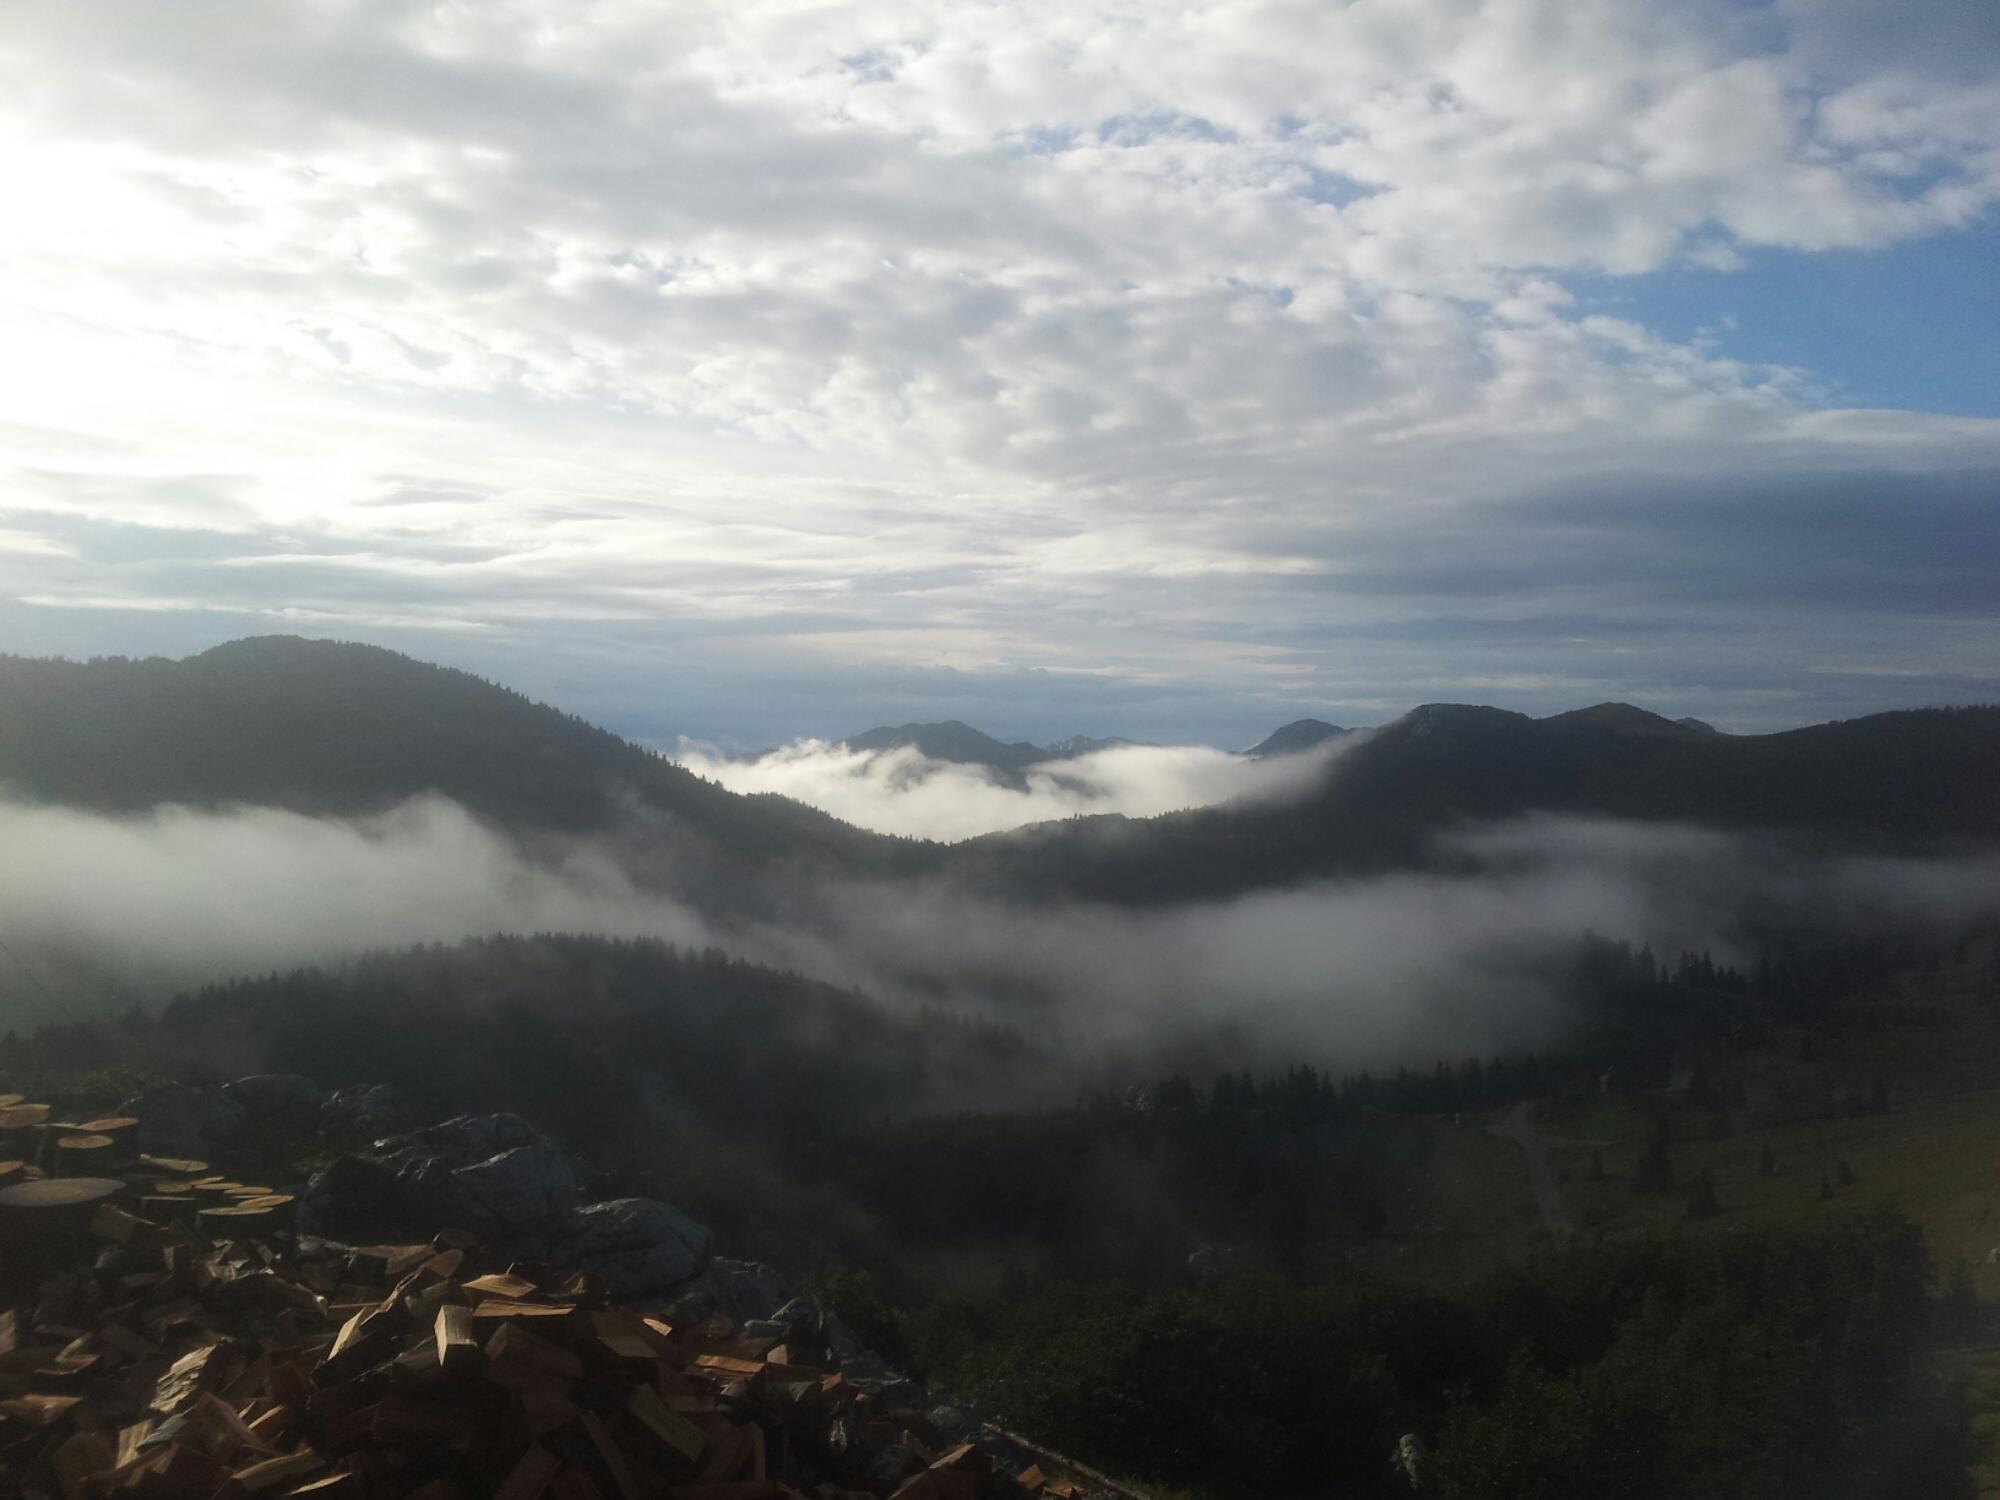 zavizan-northern-velebit-np-hiking-via-dinarica-croatia